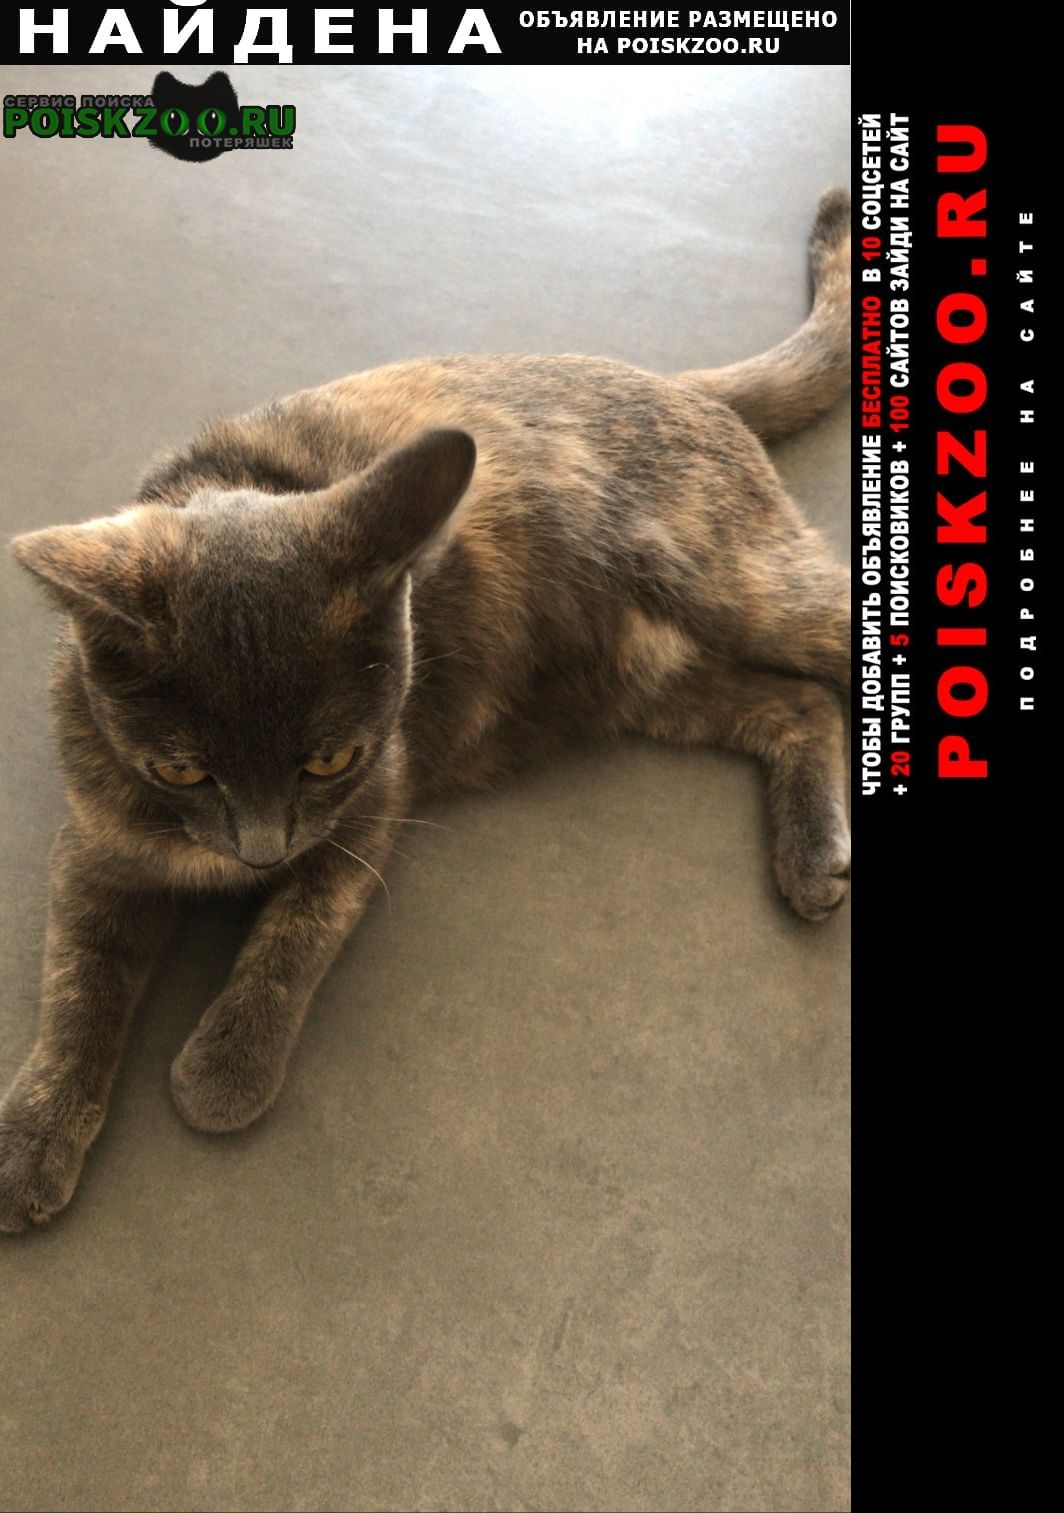 Найдена кошка ищем хозяина Астана Акмолинская обл. (Целиноградская обл.)